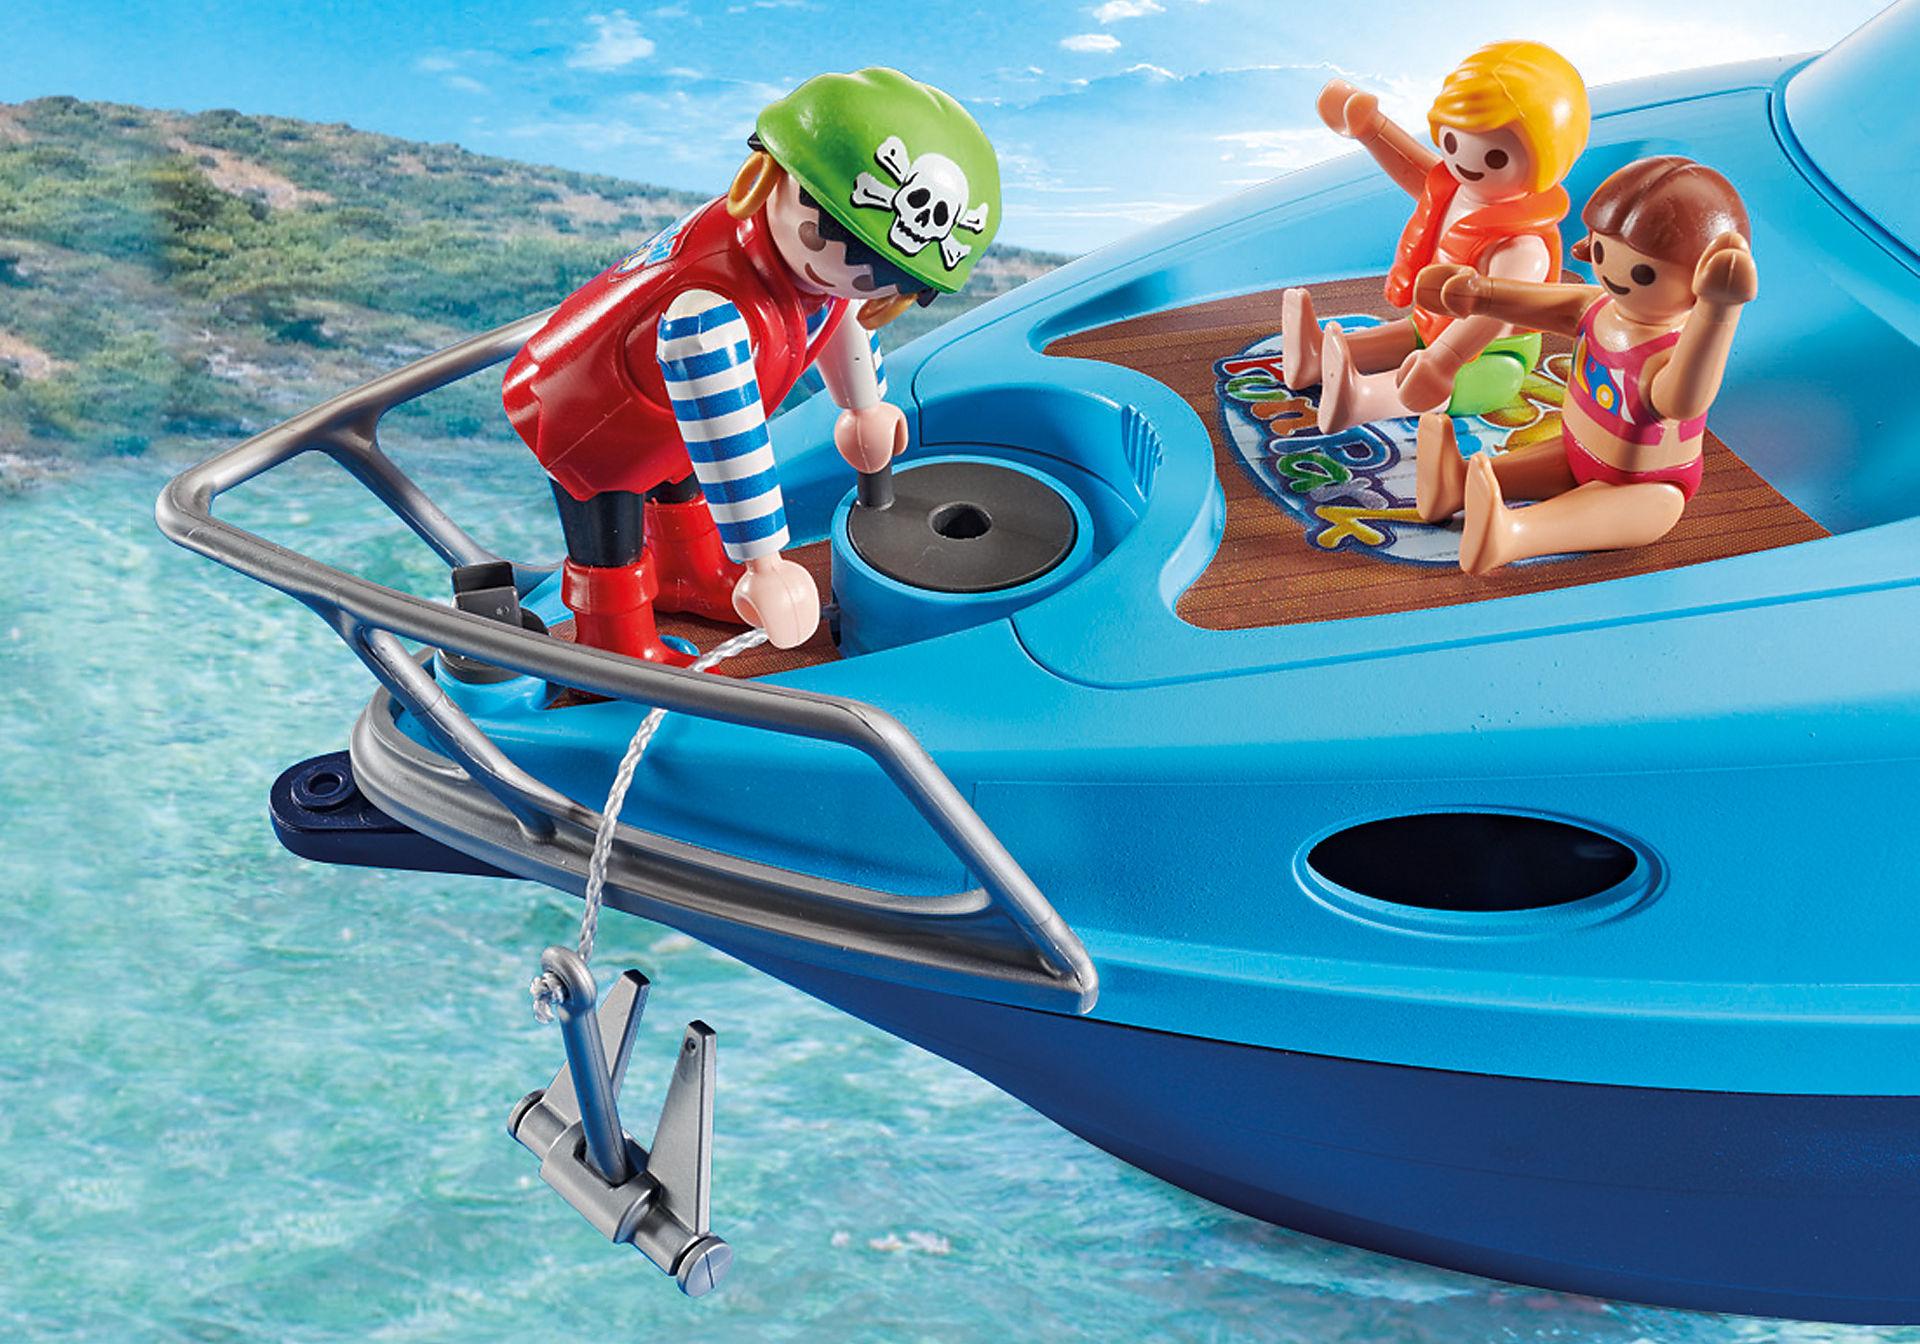 70630 PLAYMOBIL-FunPark Yacht zoom image5